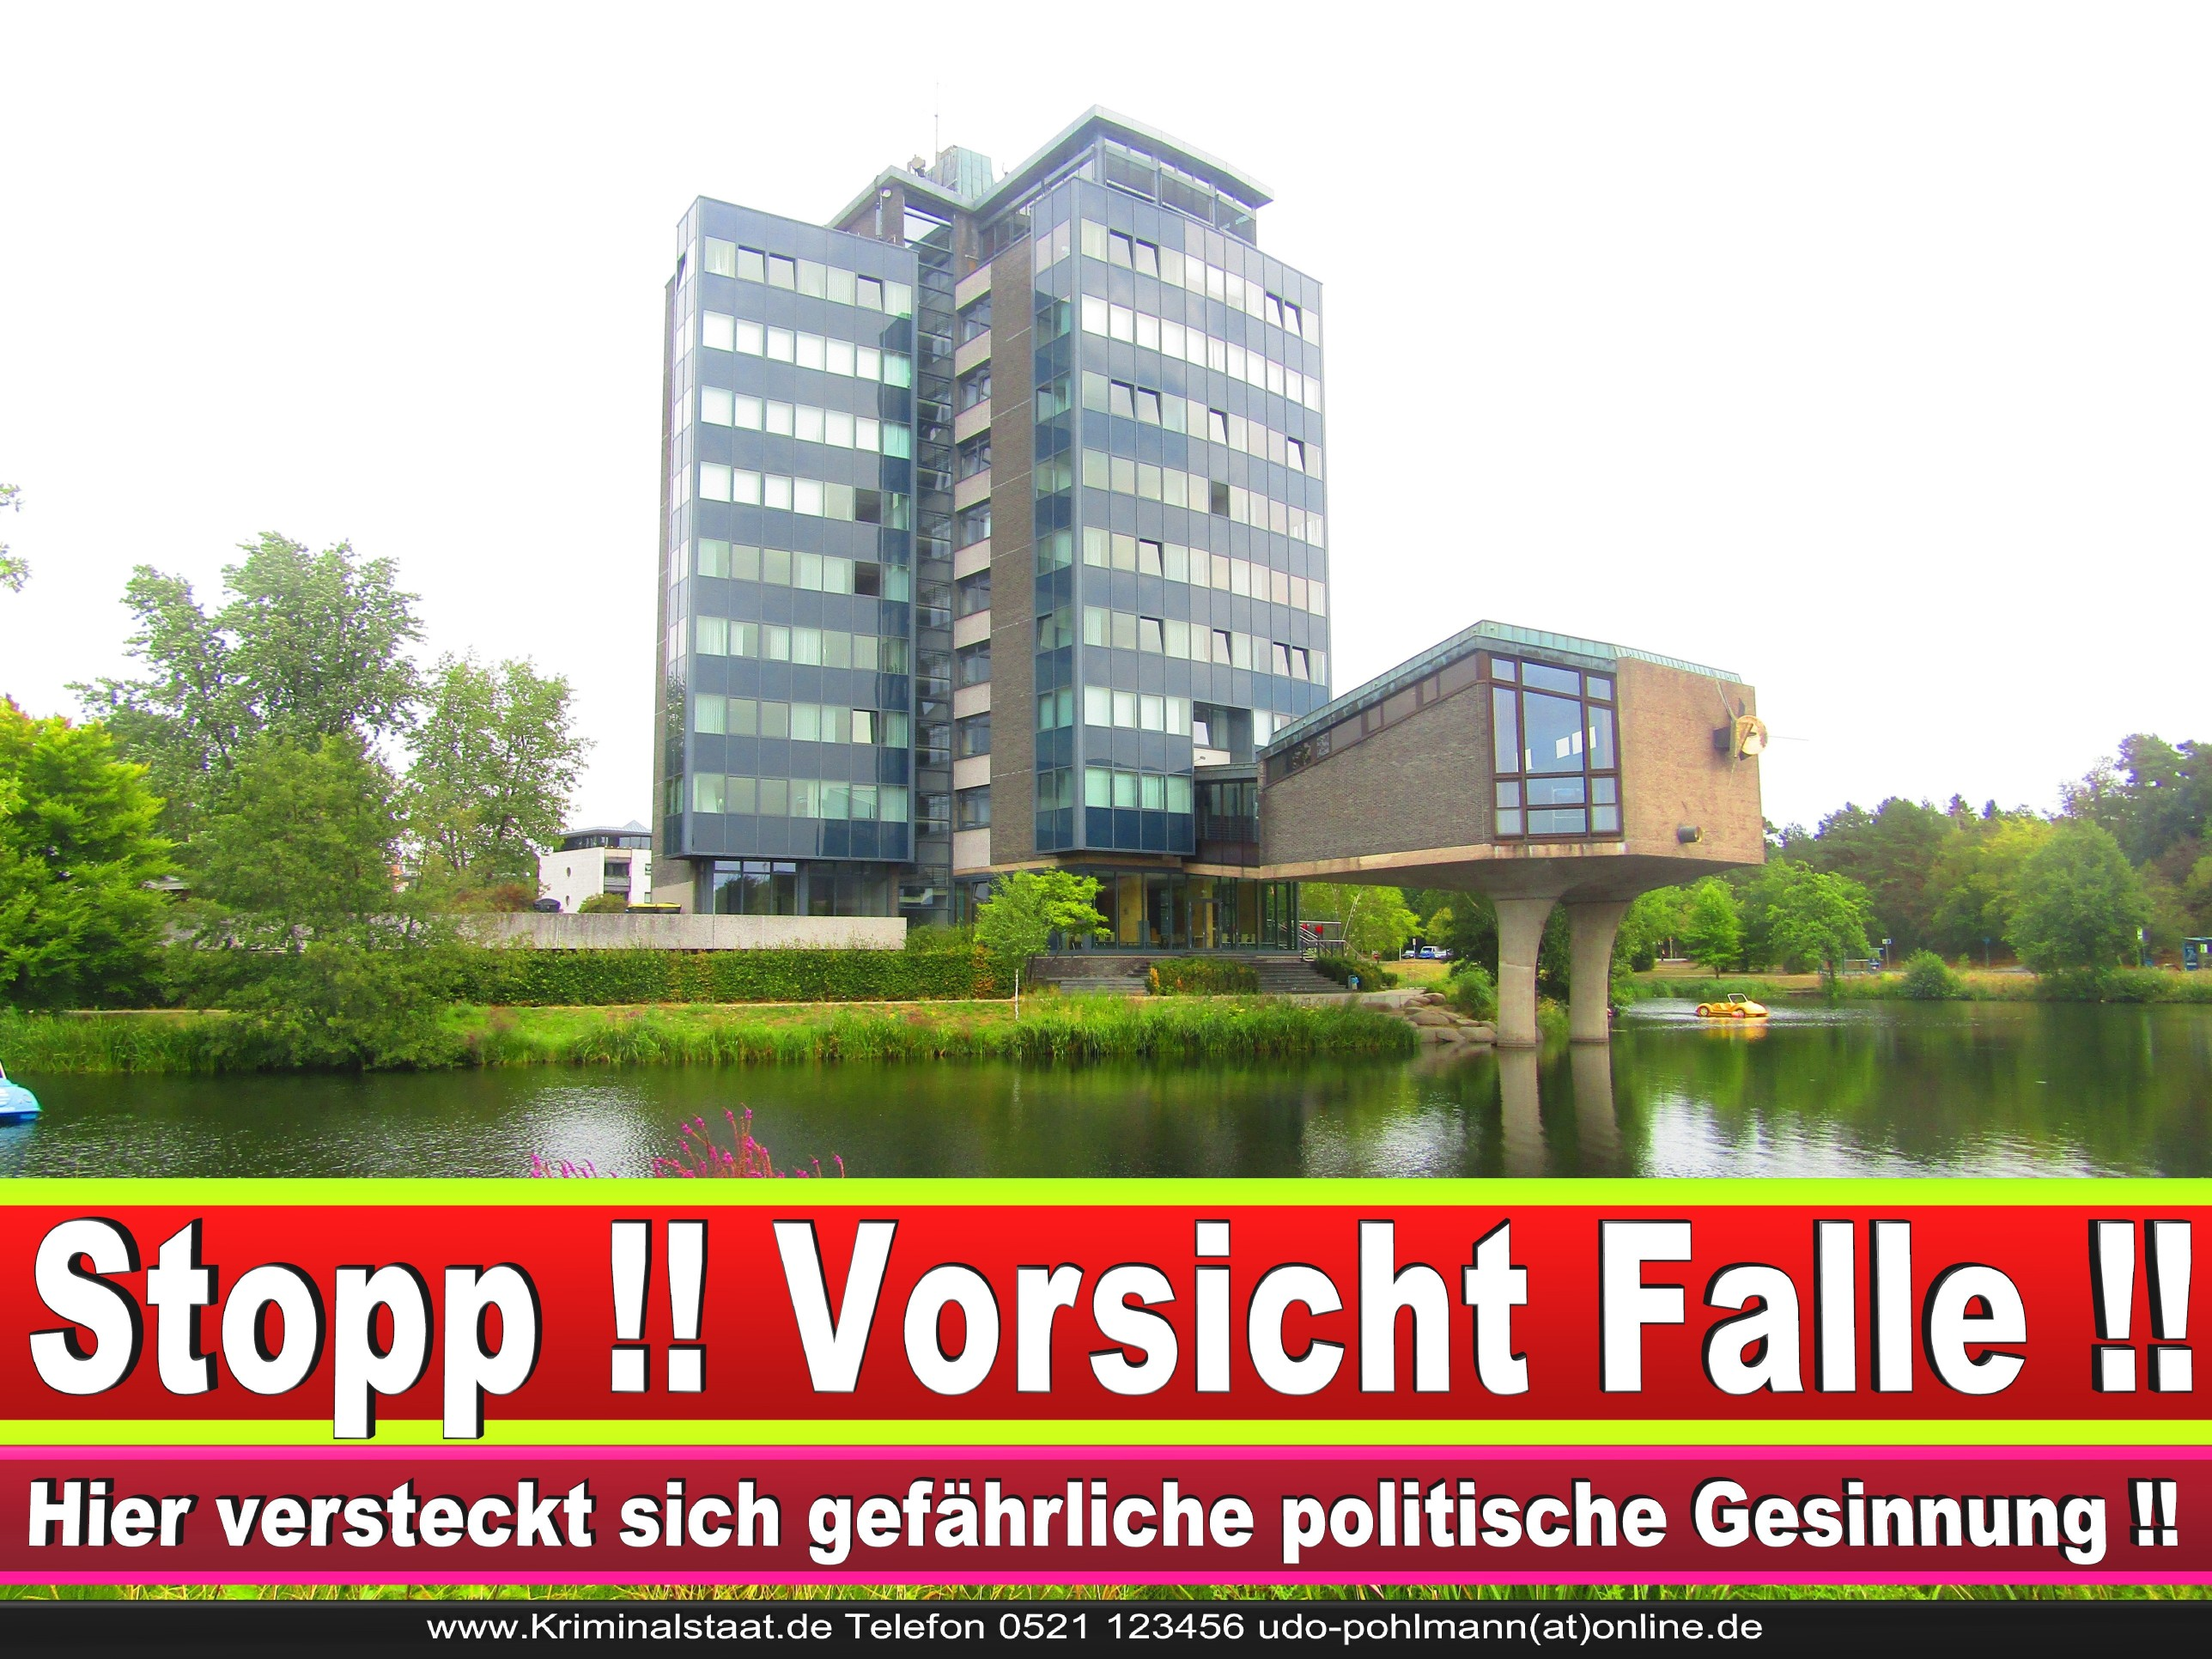 SENNESTADTVEREIN CDU BIELEFELD 6 LANDTAGSWAHL BUNDESTAGSWAHL BÜRGERMEISTERWAHL